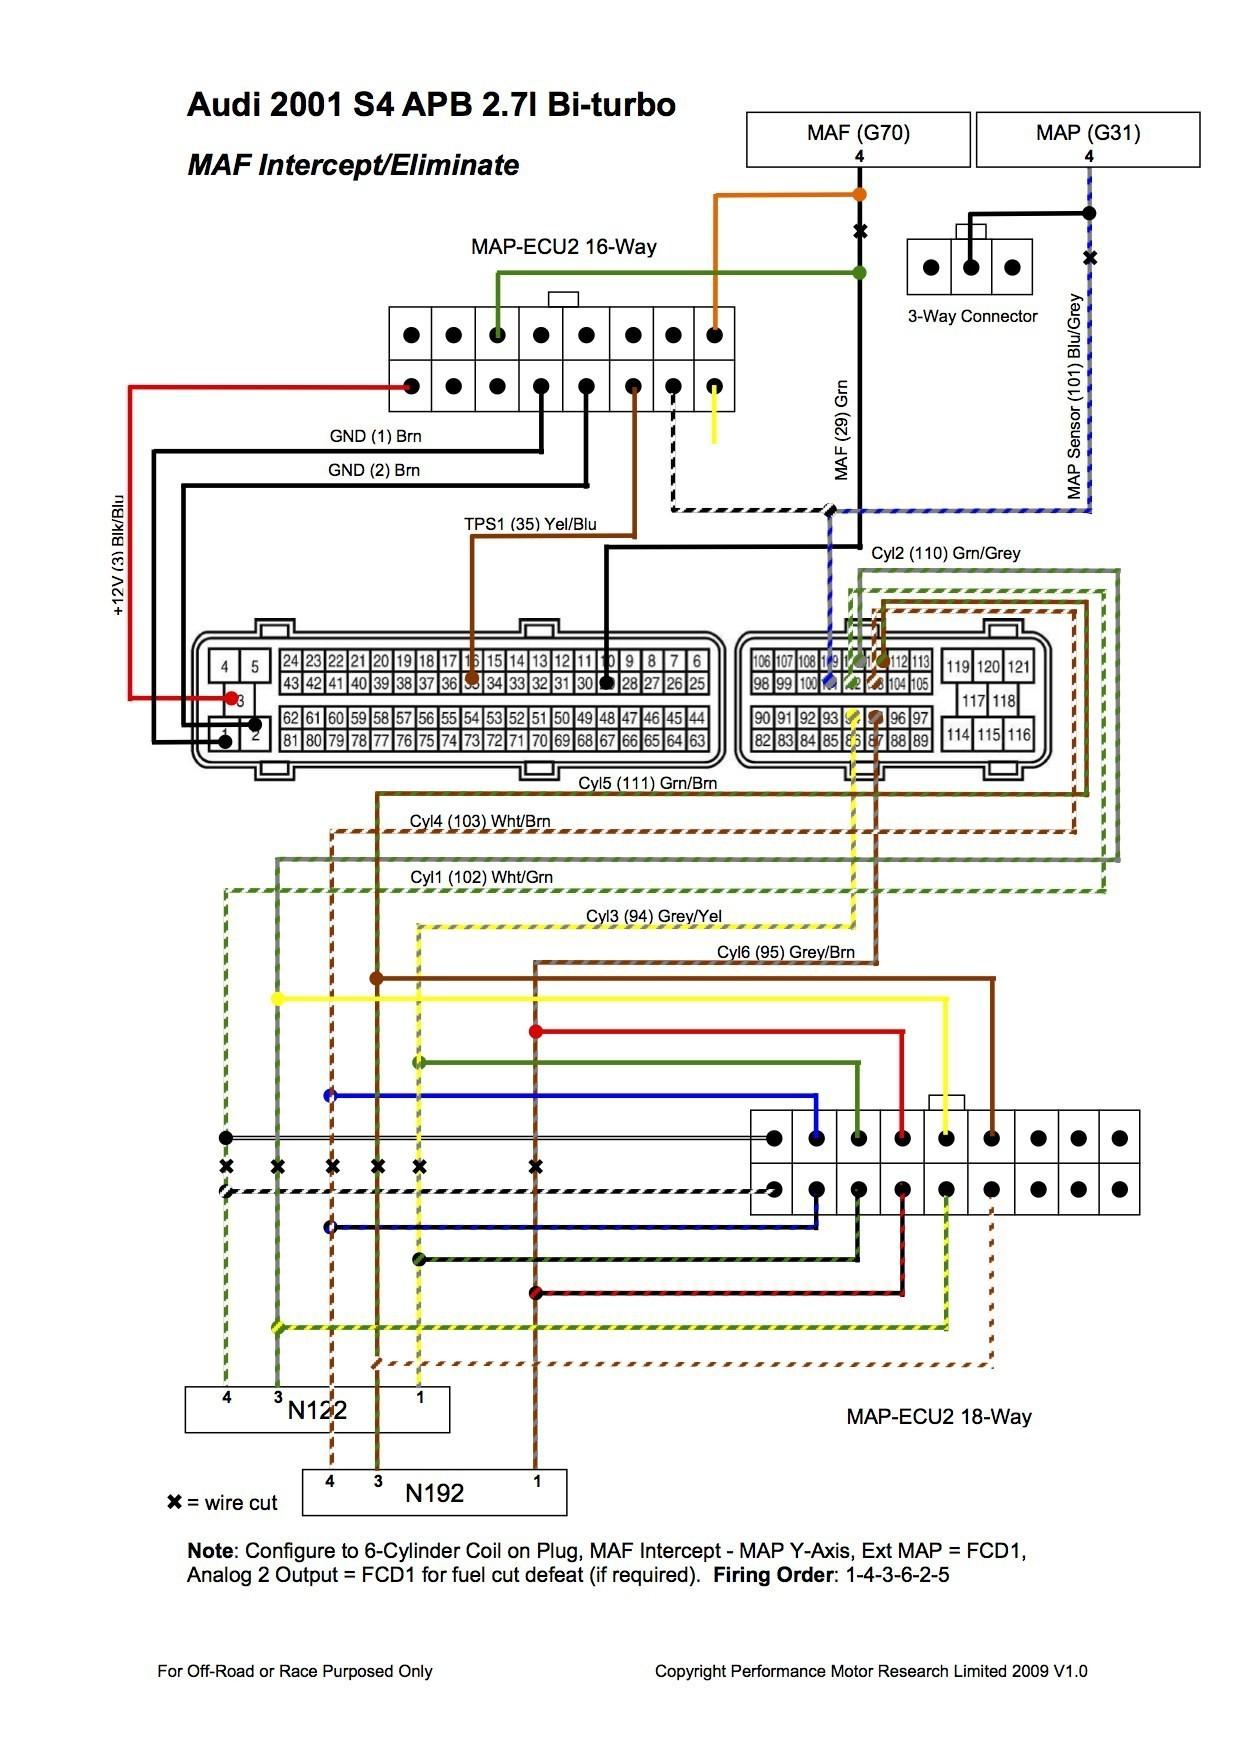 2005 Corolla Wiring Diagram Enthusiast Diagrams Malibu Remote Start Toyota Pdf Awesome Image Rh Mainetreasurechest Com Stereo